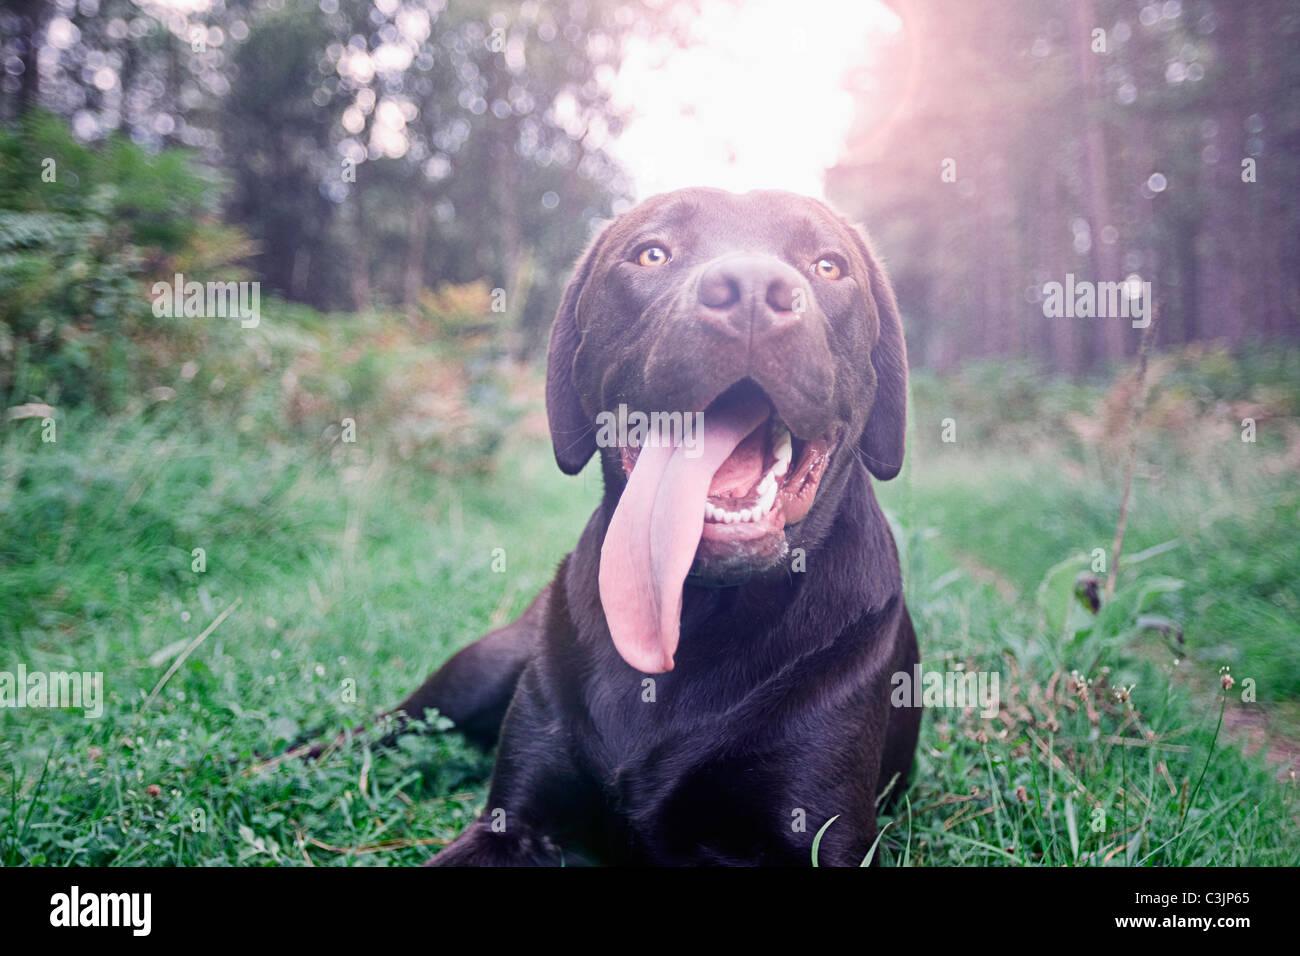 Dog panting on grass - Stock Image